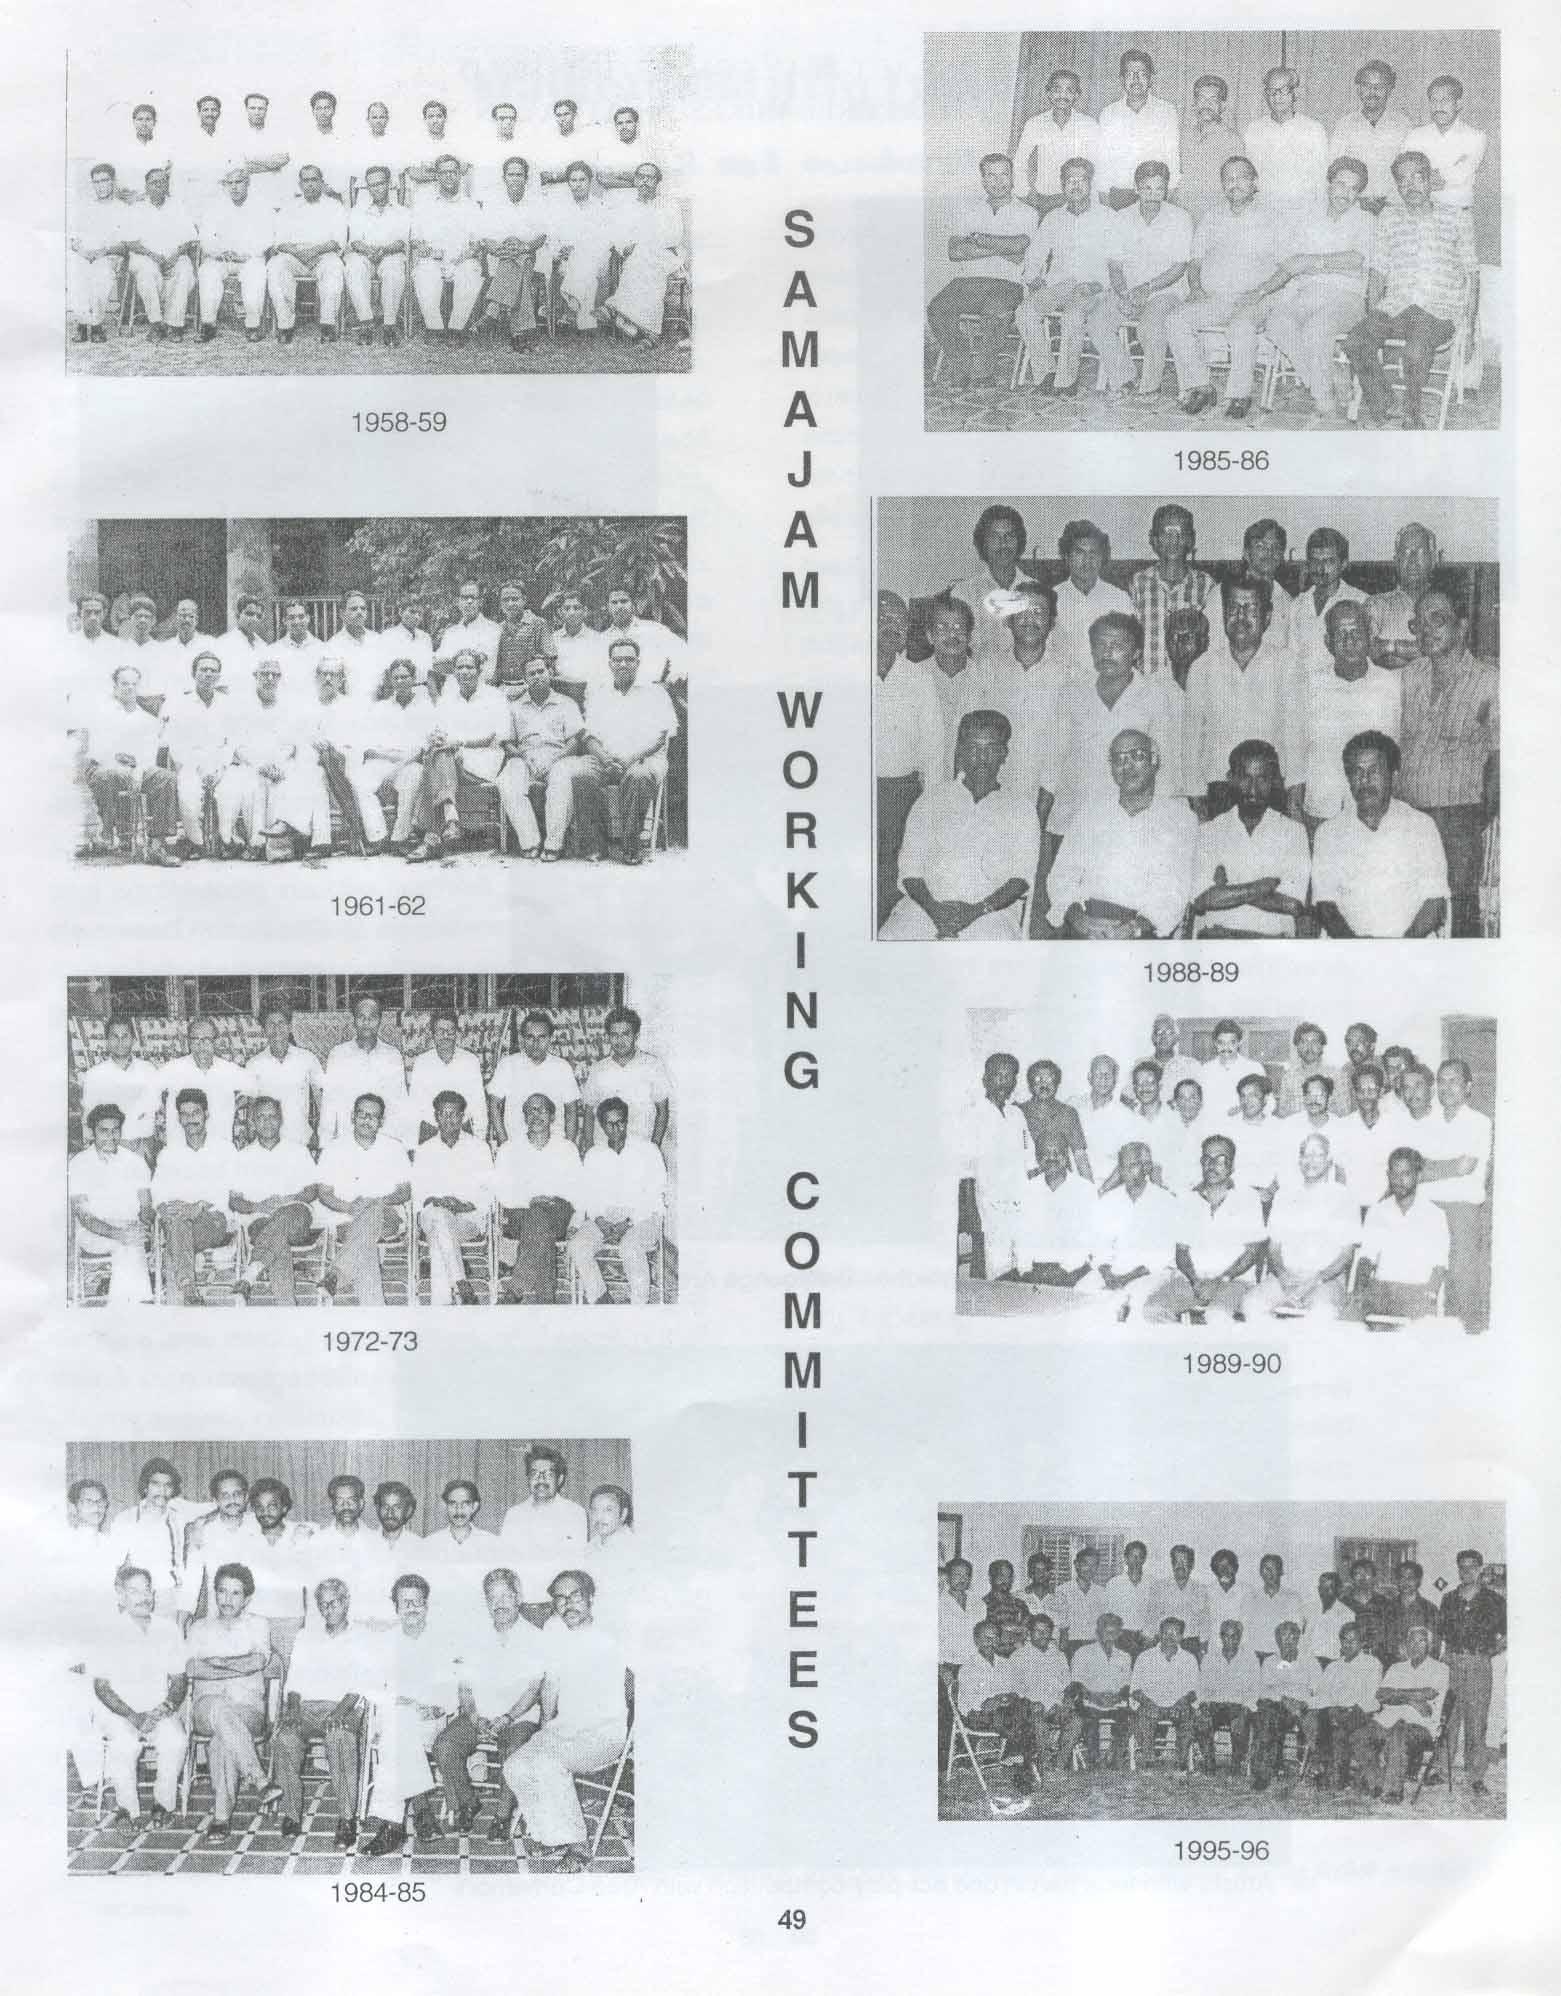 Samajam Old wOrking committee Photos